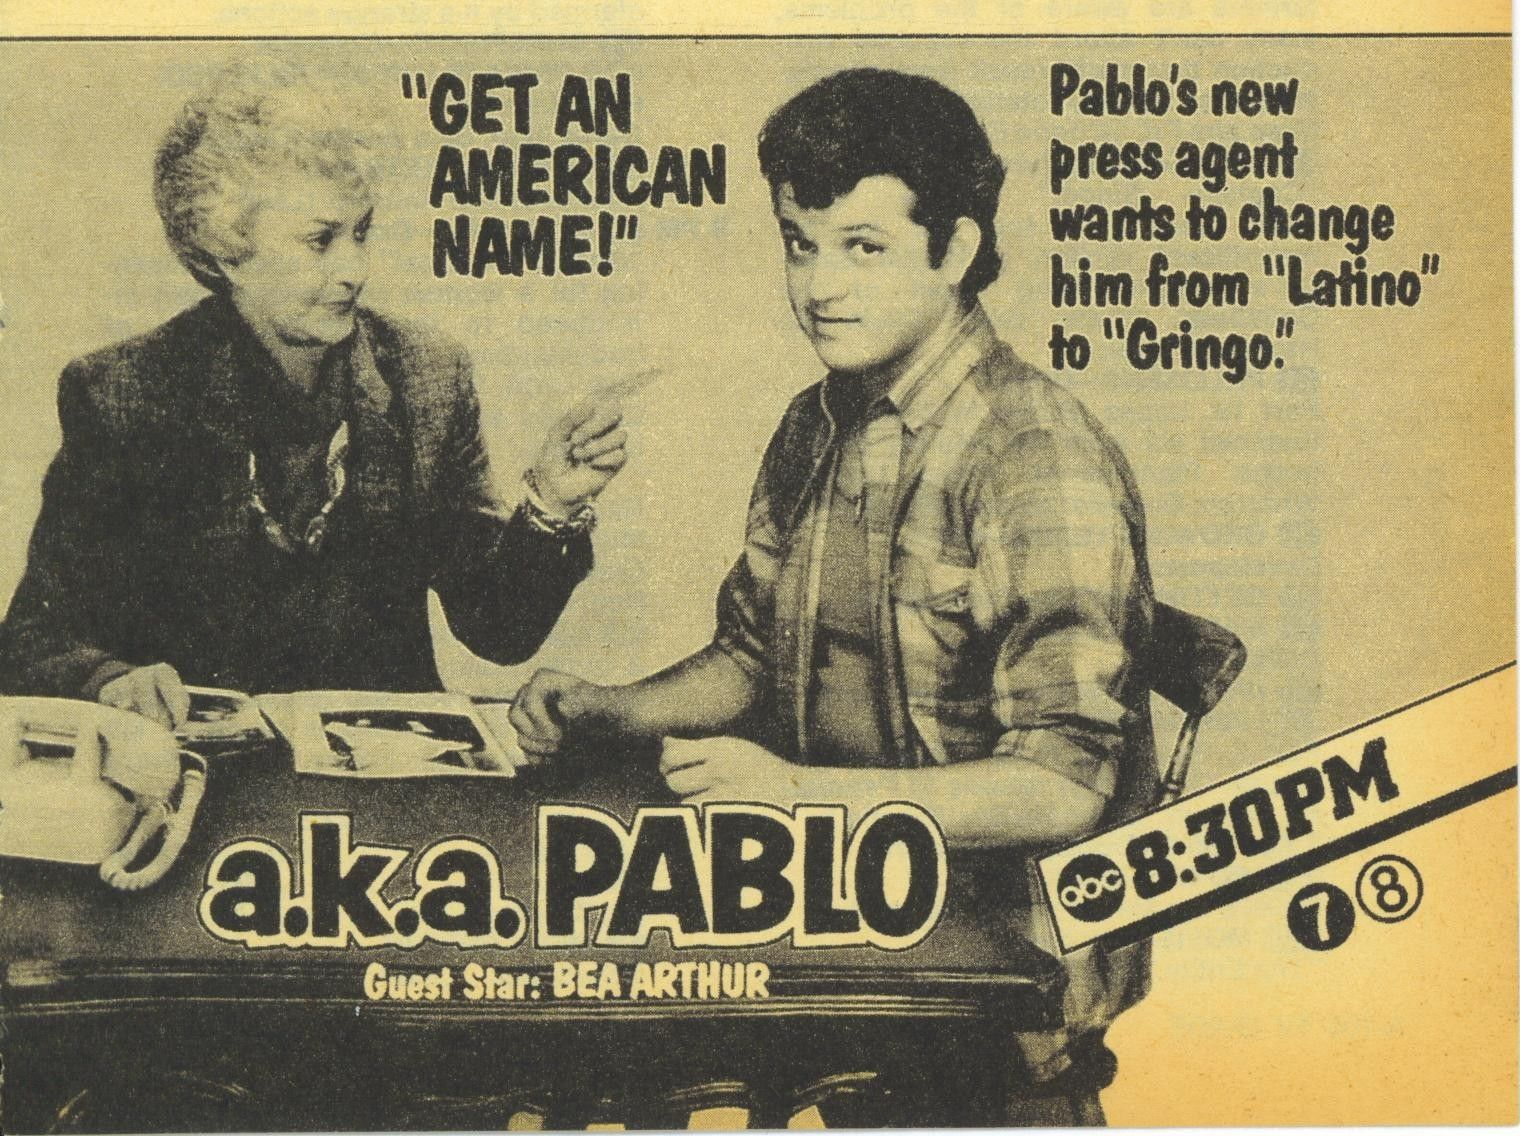 9acf573418b14 a.k.a. Pablo (TV Series 1984) - IMDb